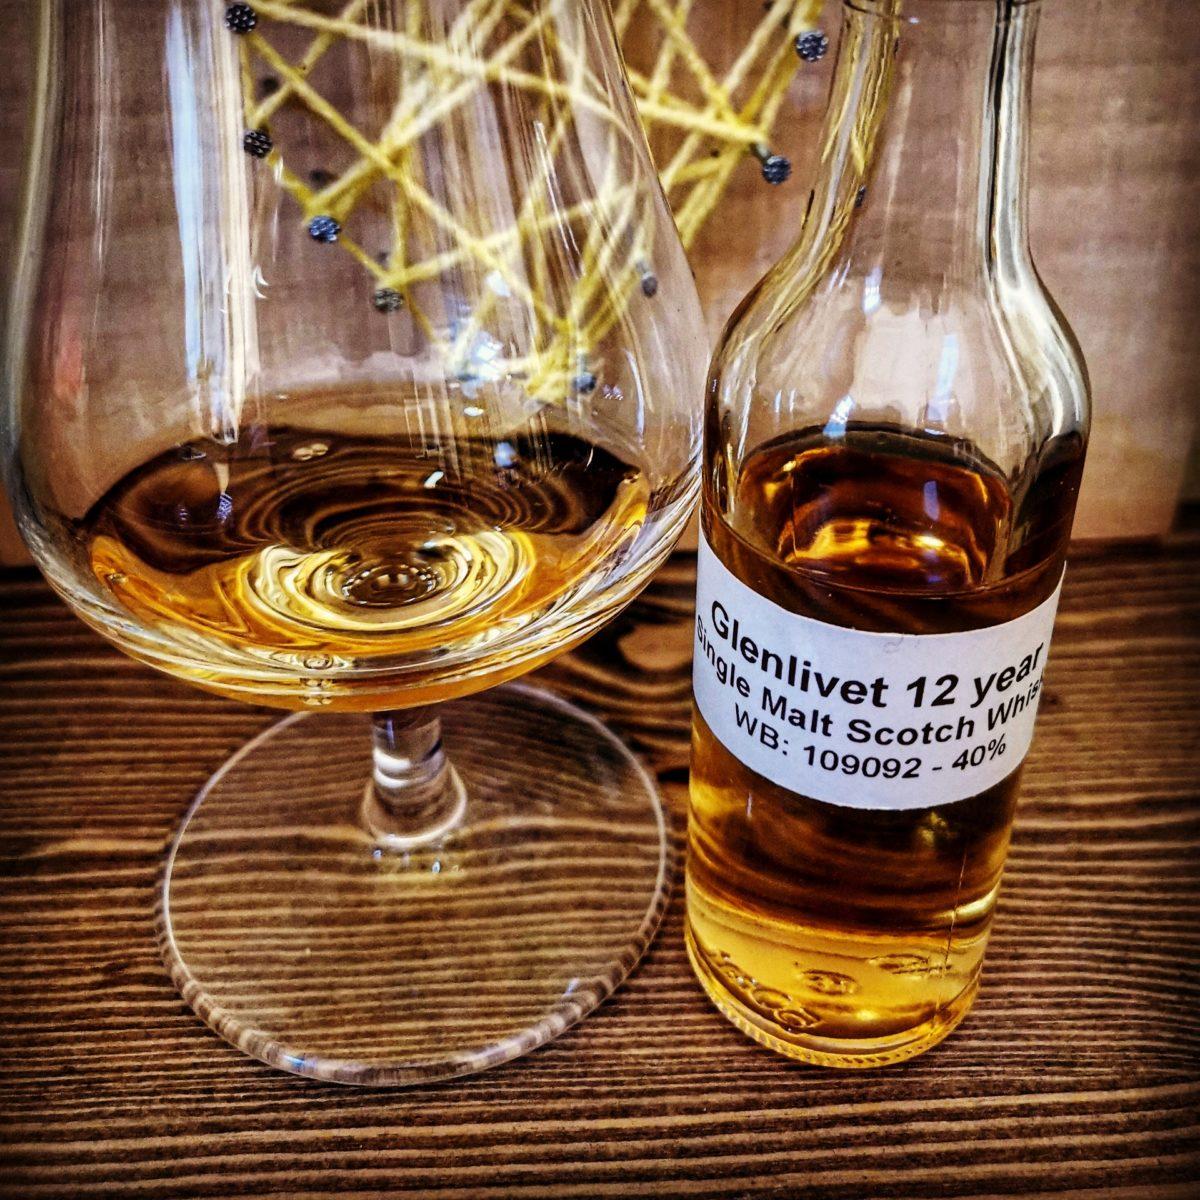 The Glenlivet 12 Jahre Speyside Single Malt Scotch Whisky